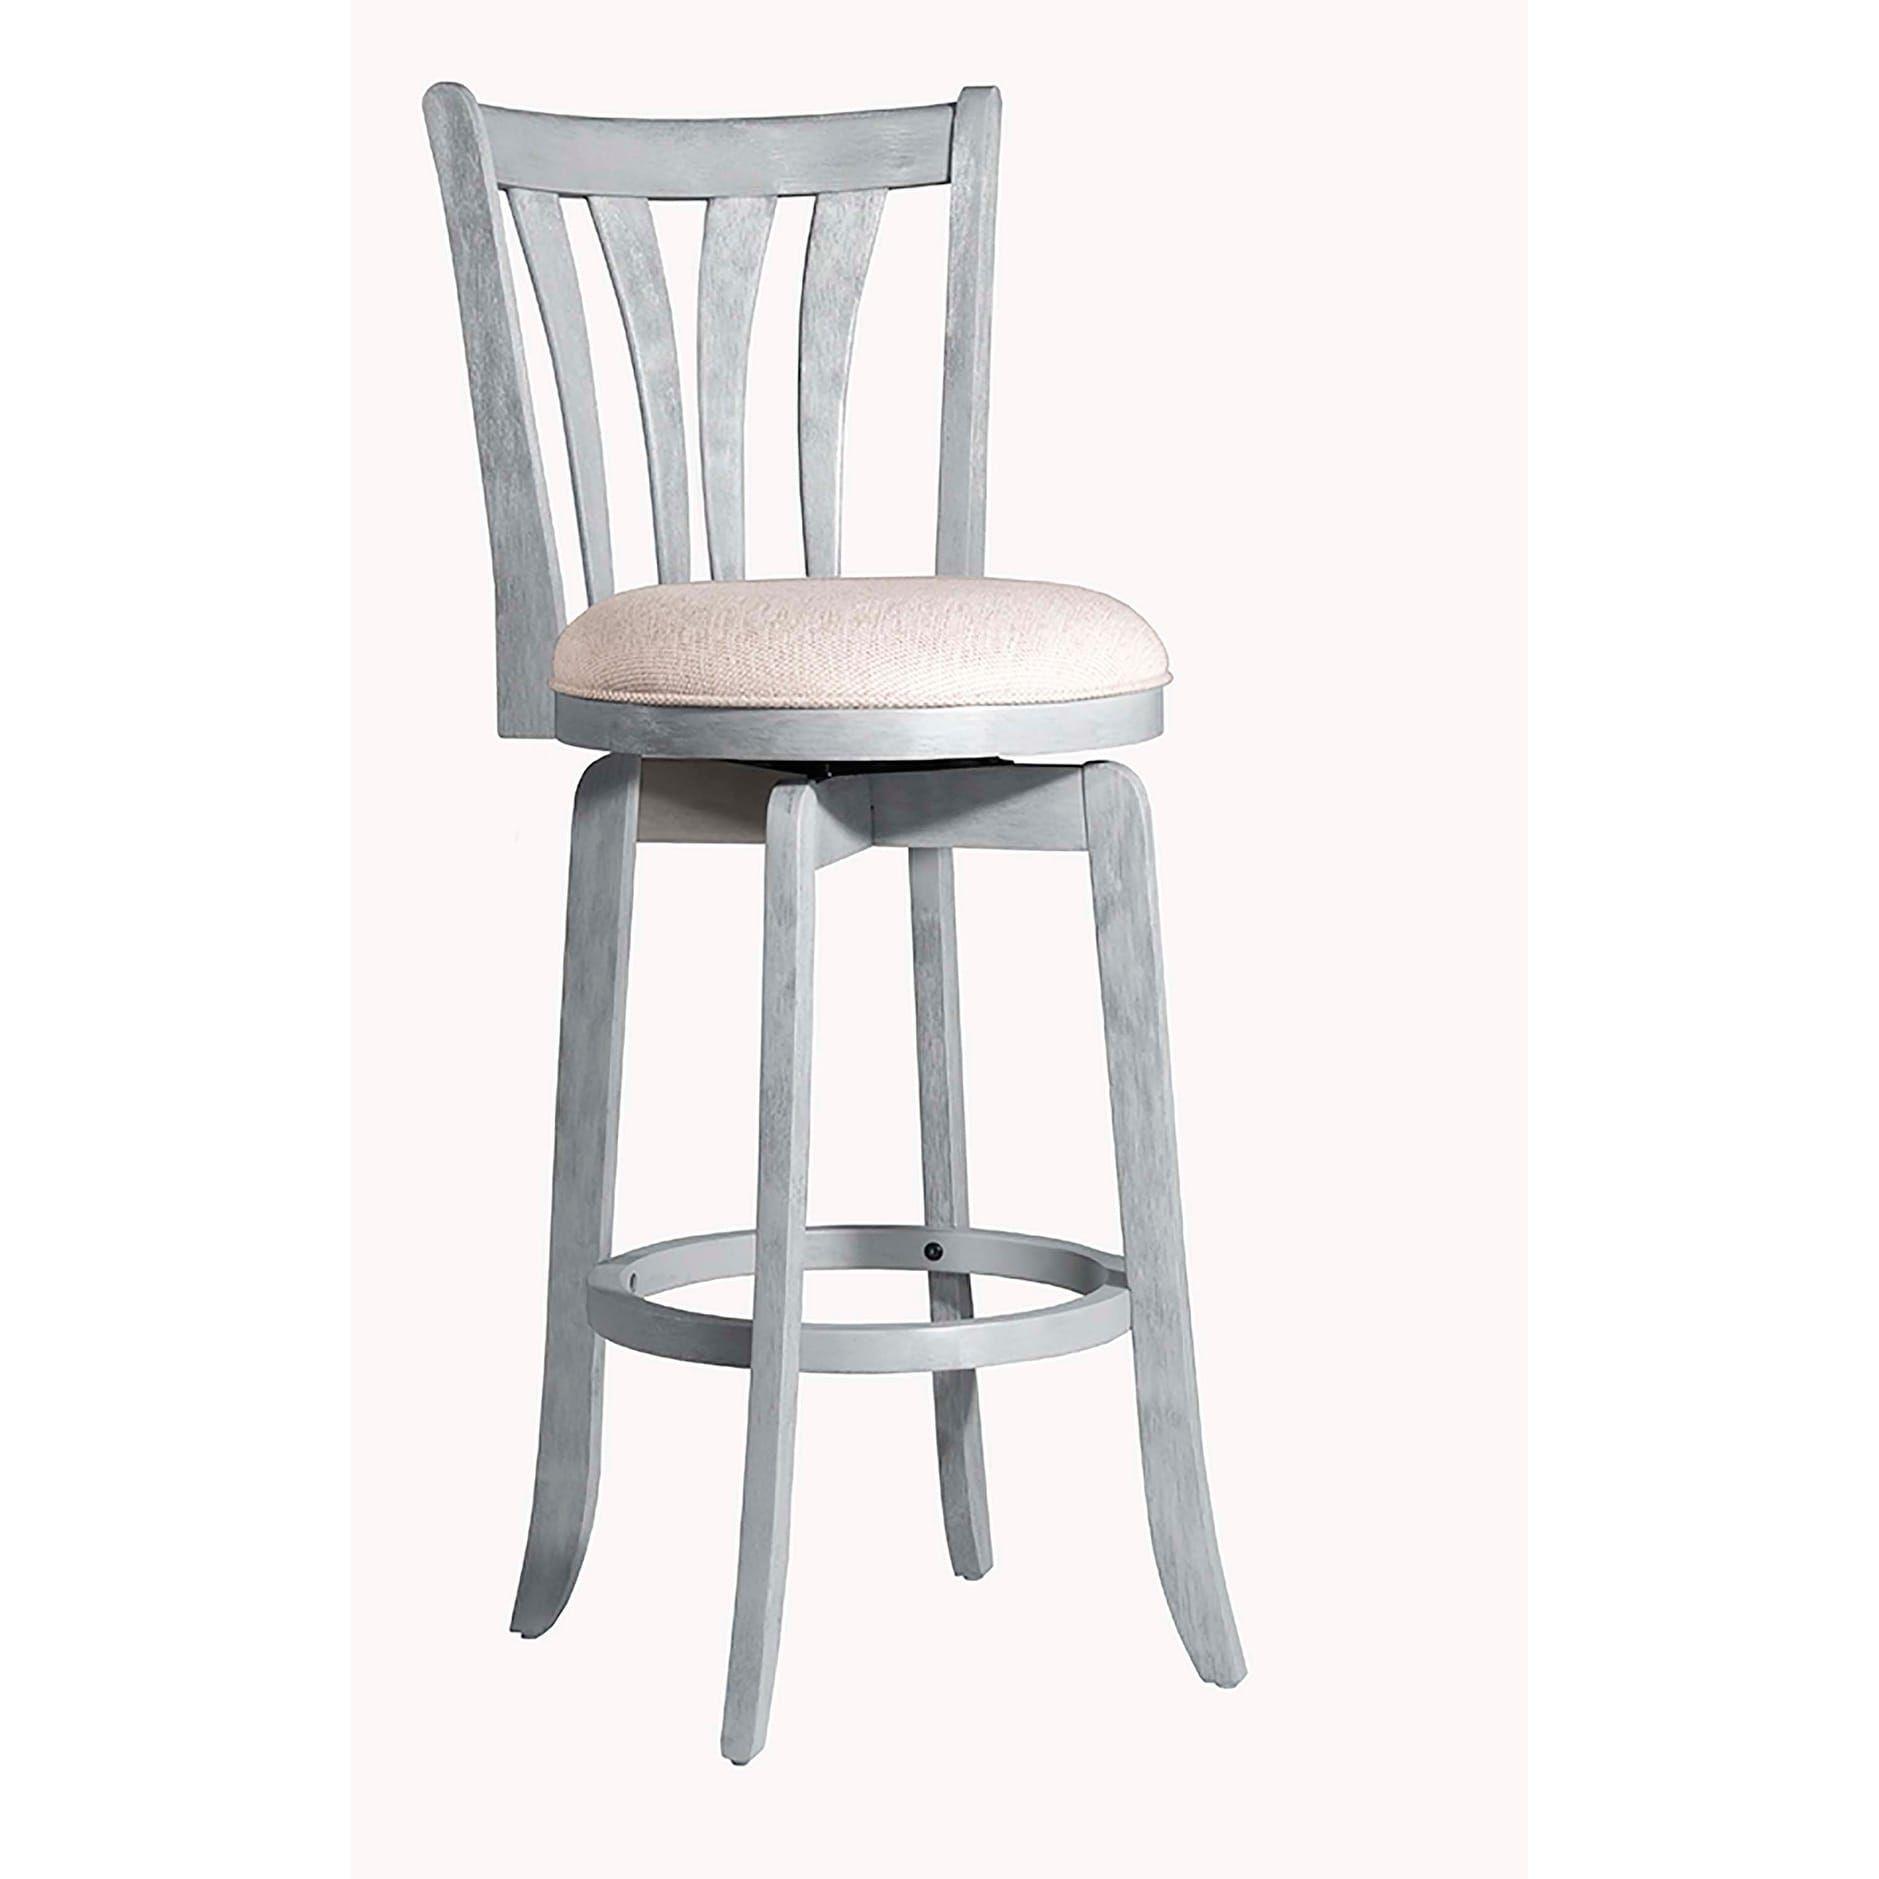 Hilale Furniture Savana Blue 30 Inch Swivel Bar Stool Wirebrush Modern Clic 40 To 44 Inches Wood Fabric